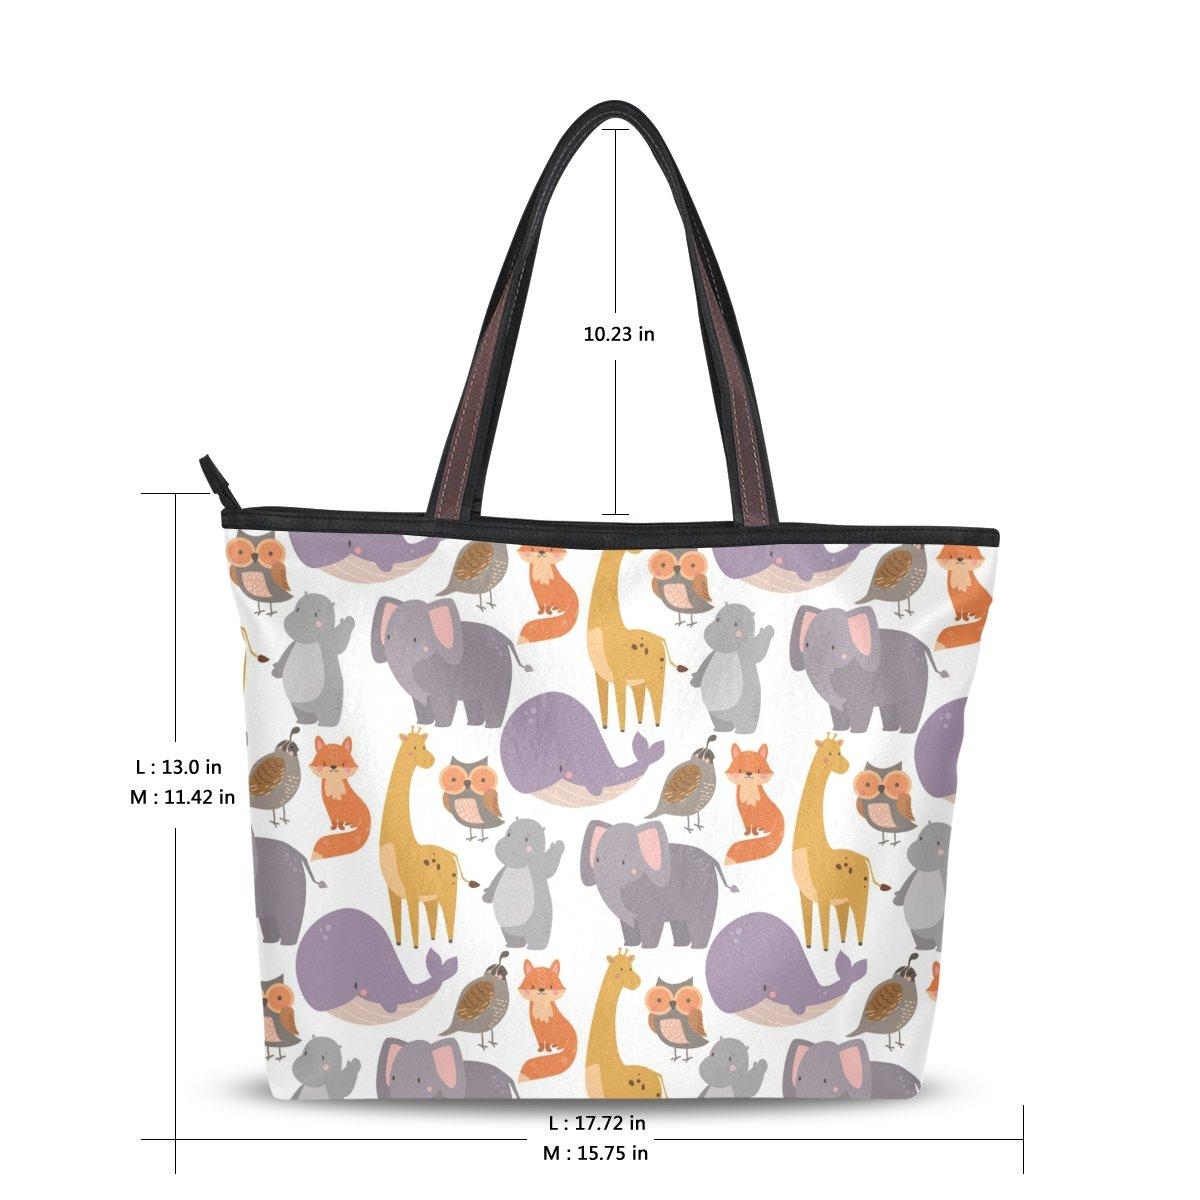 WIHVE Elephant Fox Whale Womens Tote Bag Top Handle Satchel Handbags Shoulder Bags